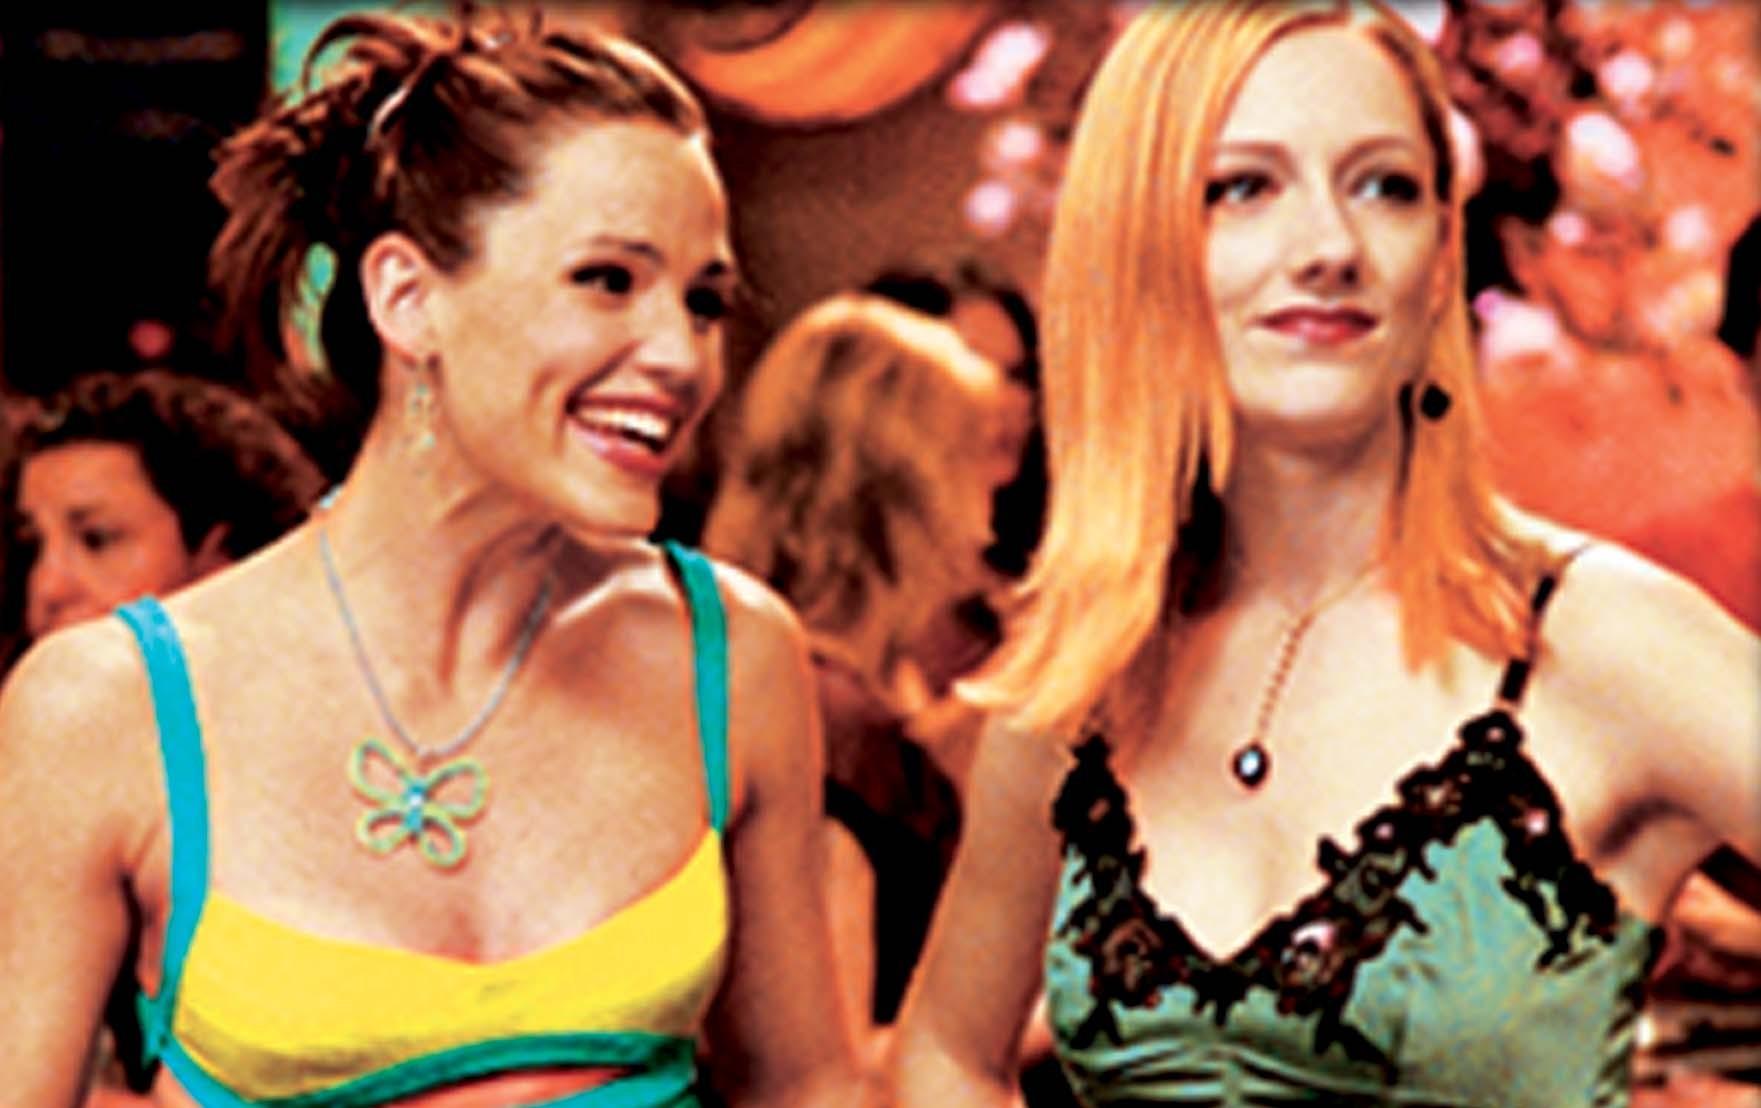 Jennifer Garner and Judy Greer in 13 Going on 30 (2004)